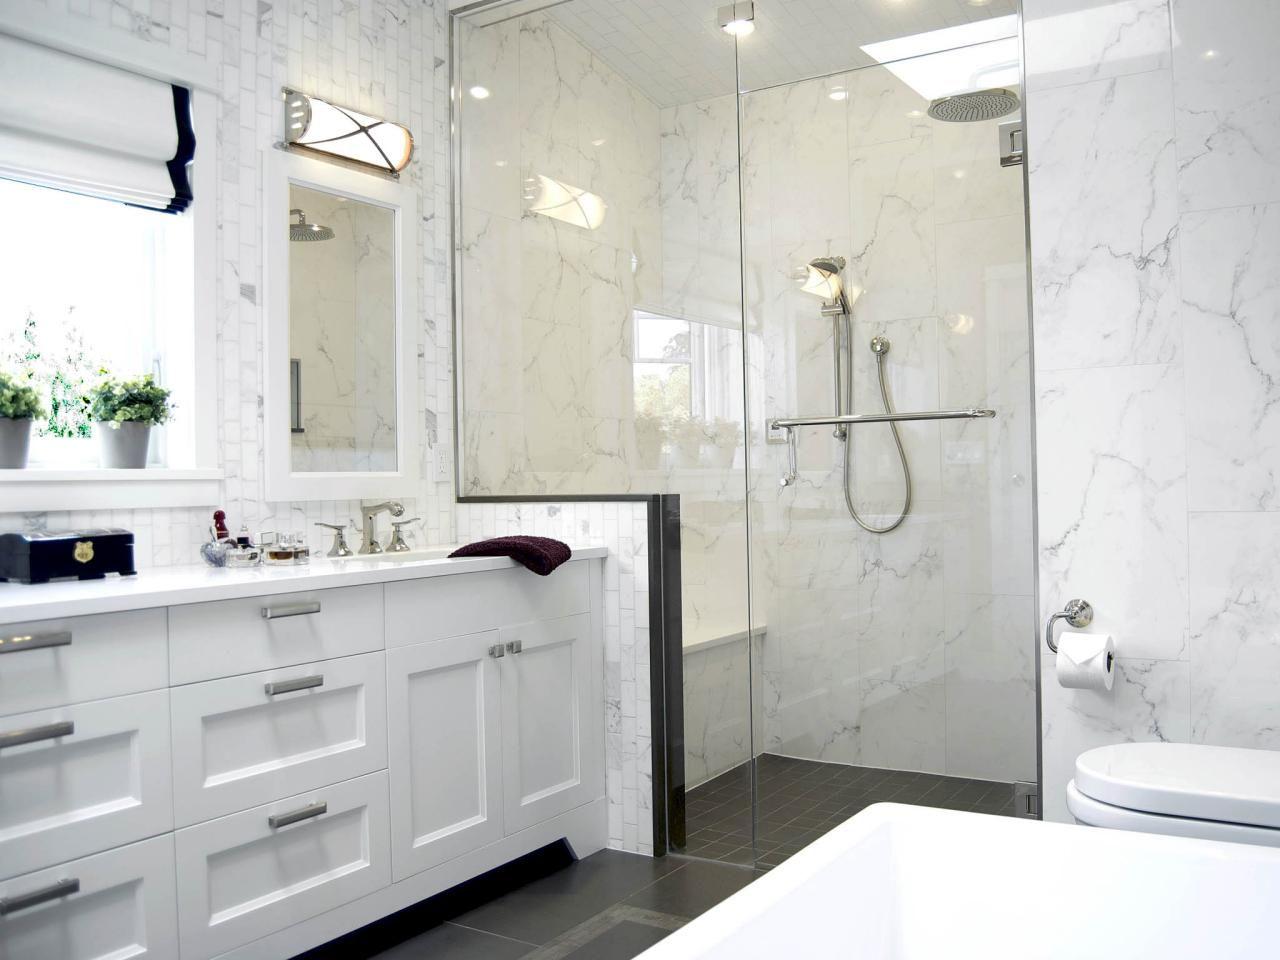 Best Bathroom Designs 2014 Best Small Bathroom Designs 2014 Top ...